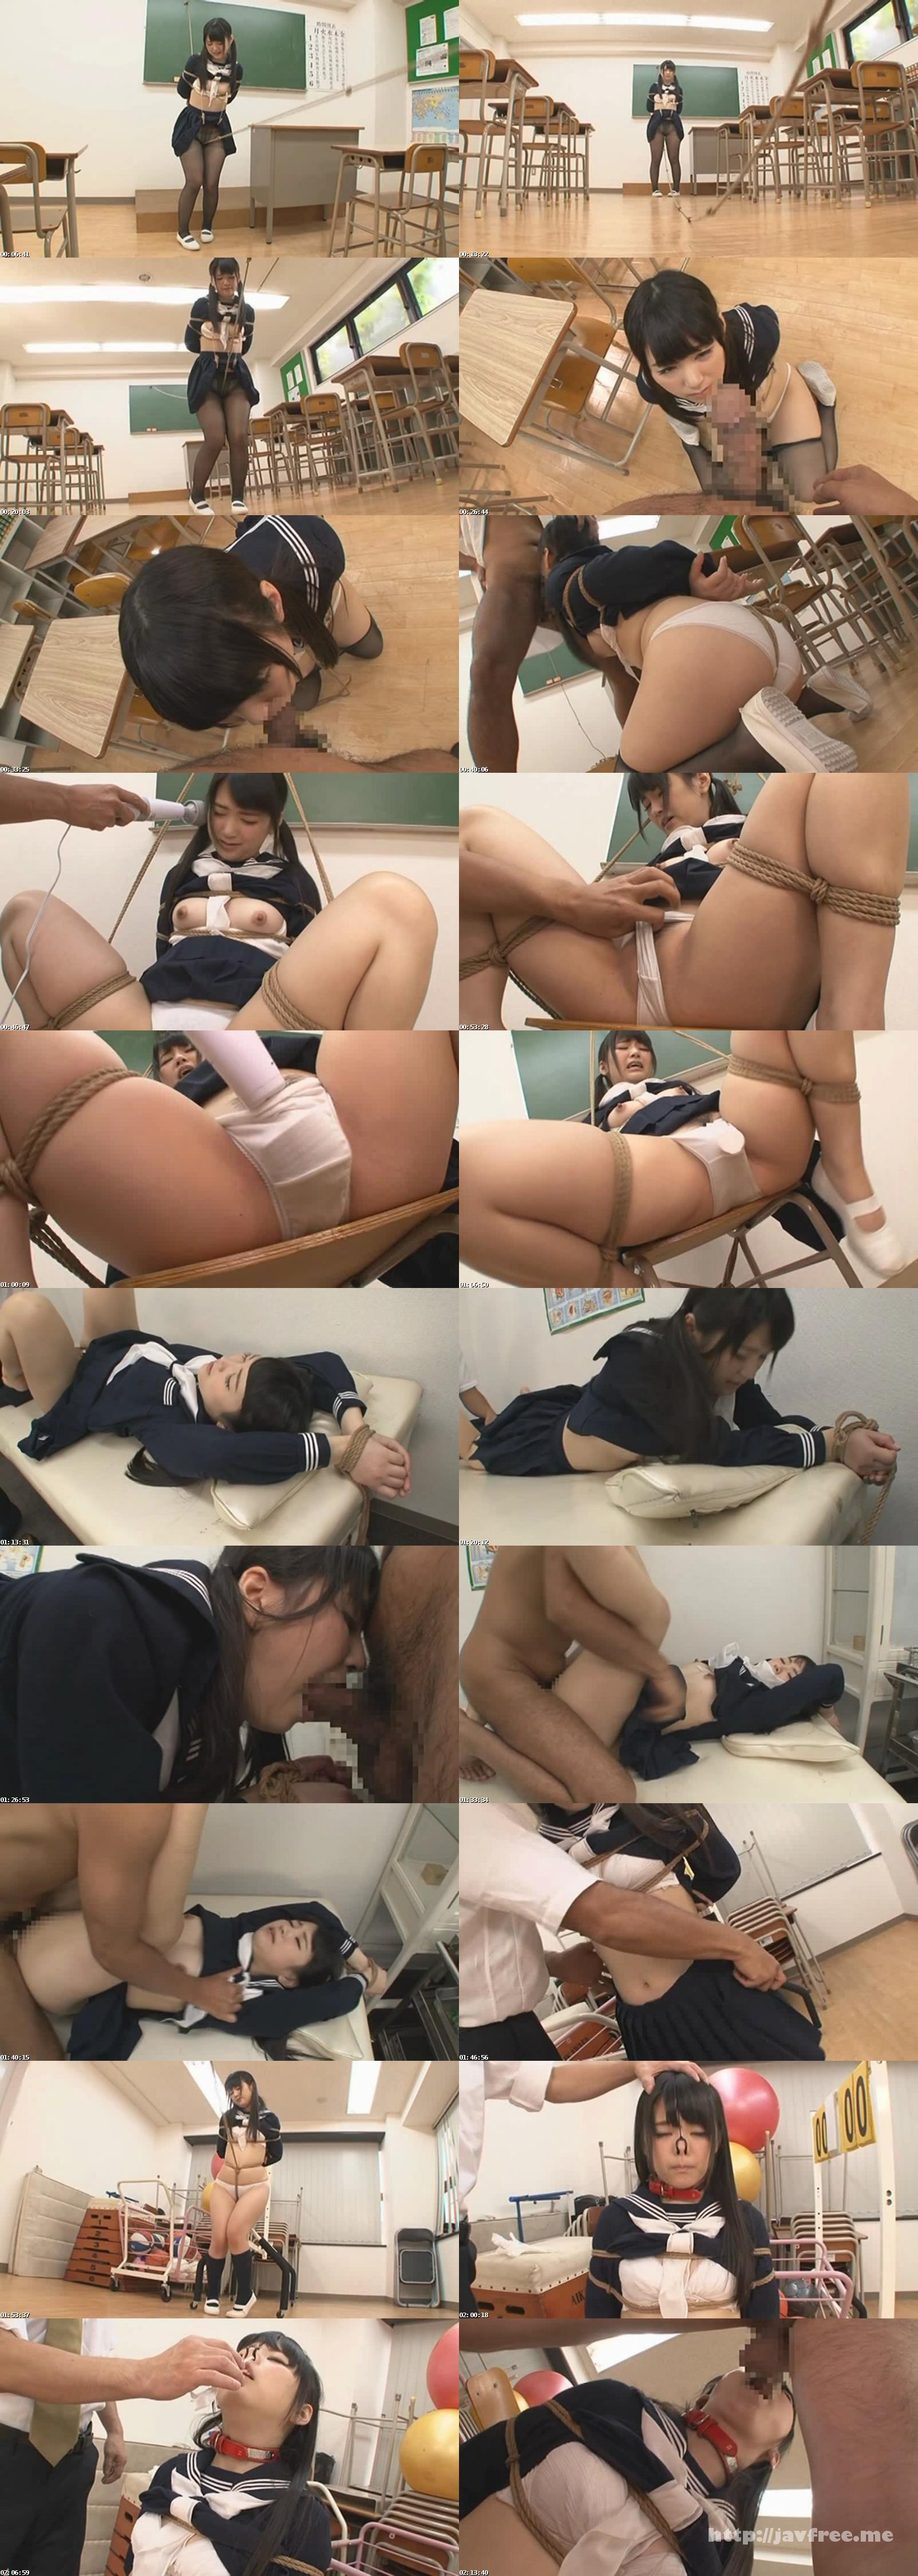 [NKD-145] 喰い込み少女股間責め 3 木村つな - image NKD-145 on https://javfree.me